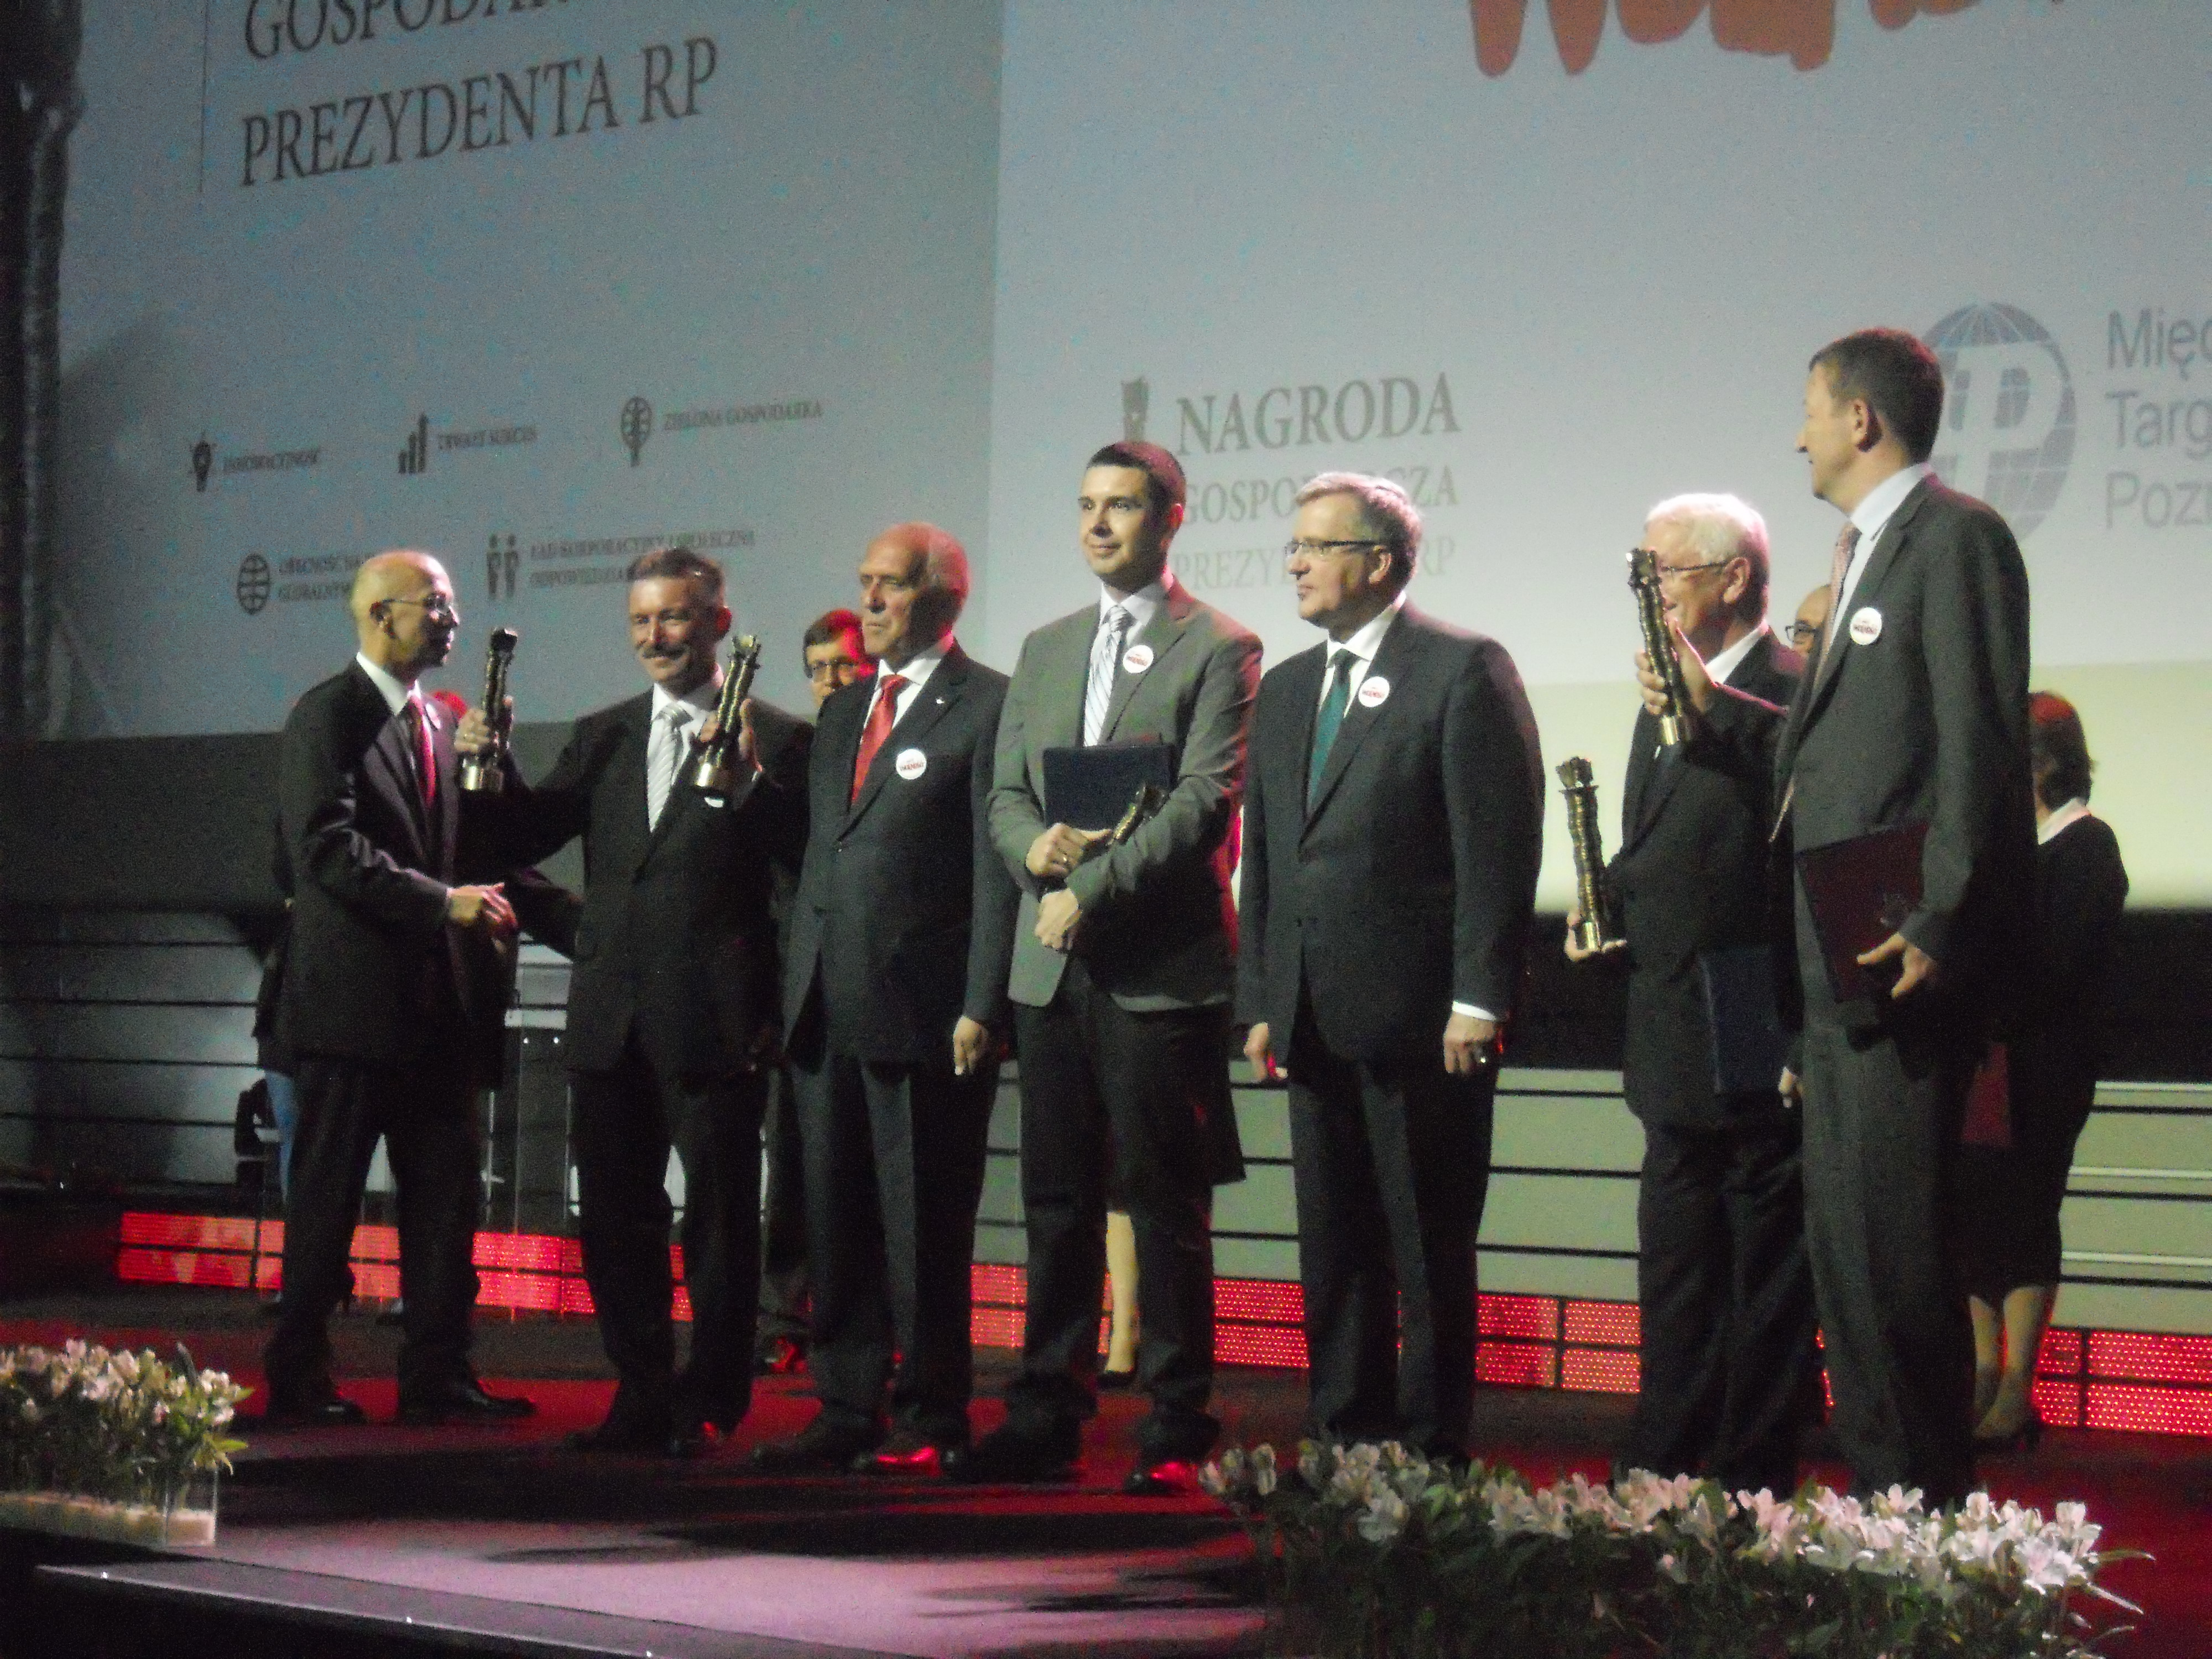 grupa-psb-otrzymala-nagrode-gospodarcza-prezydenta-rp